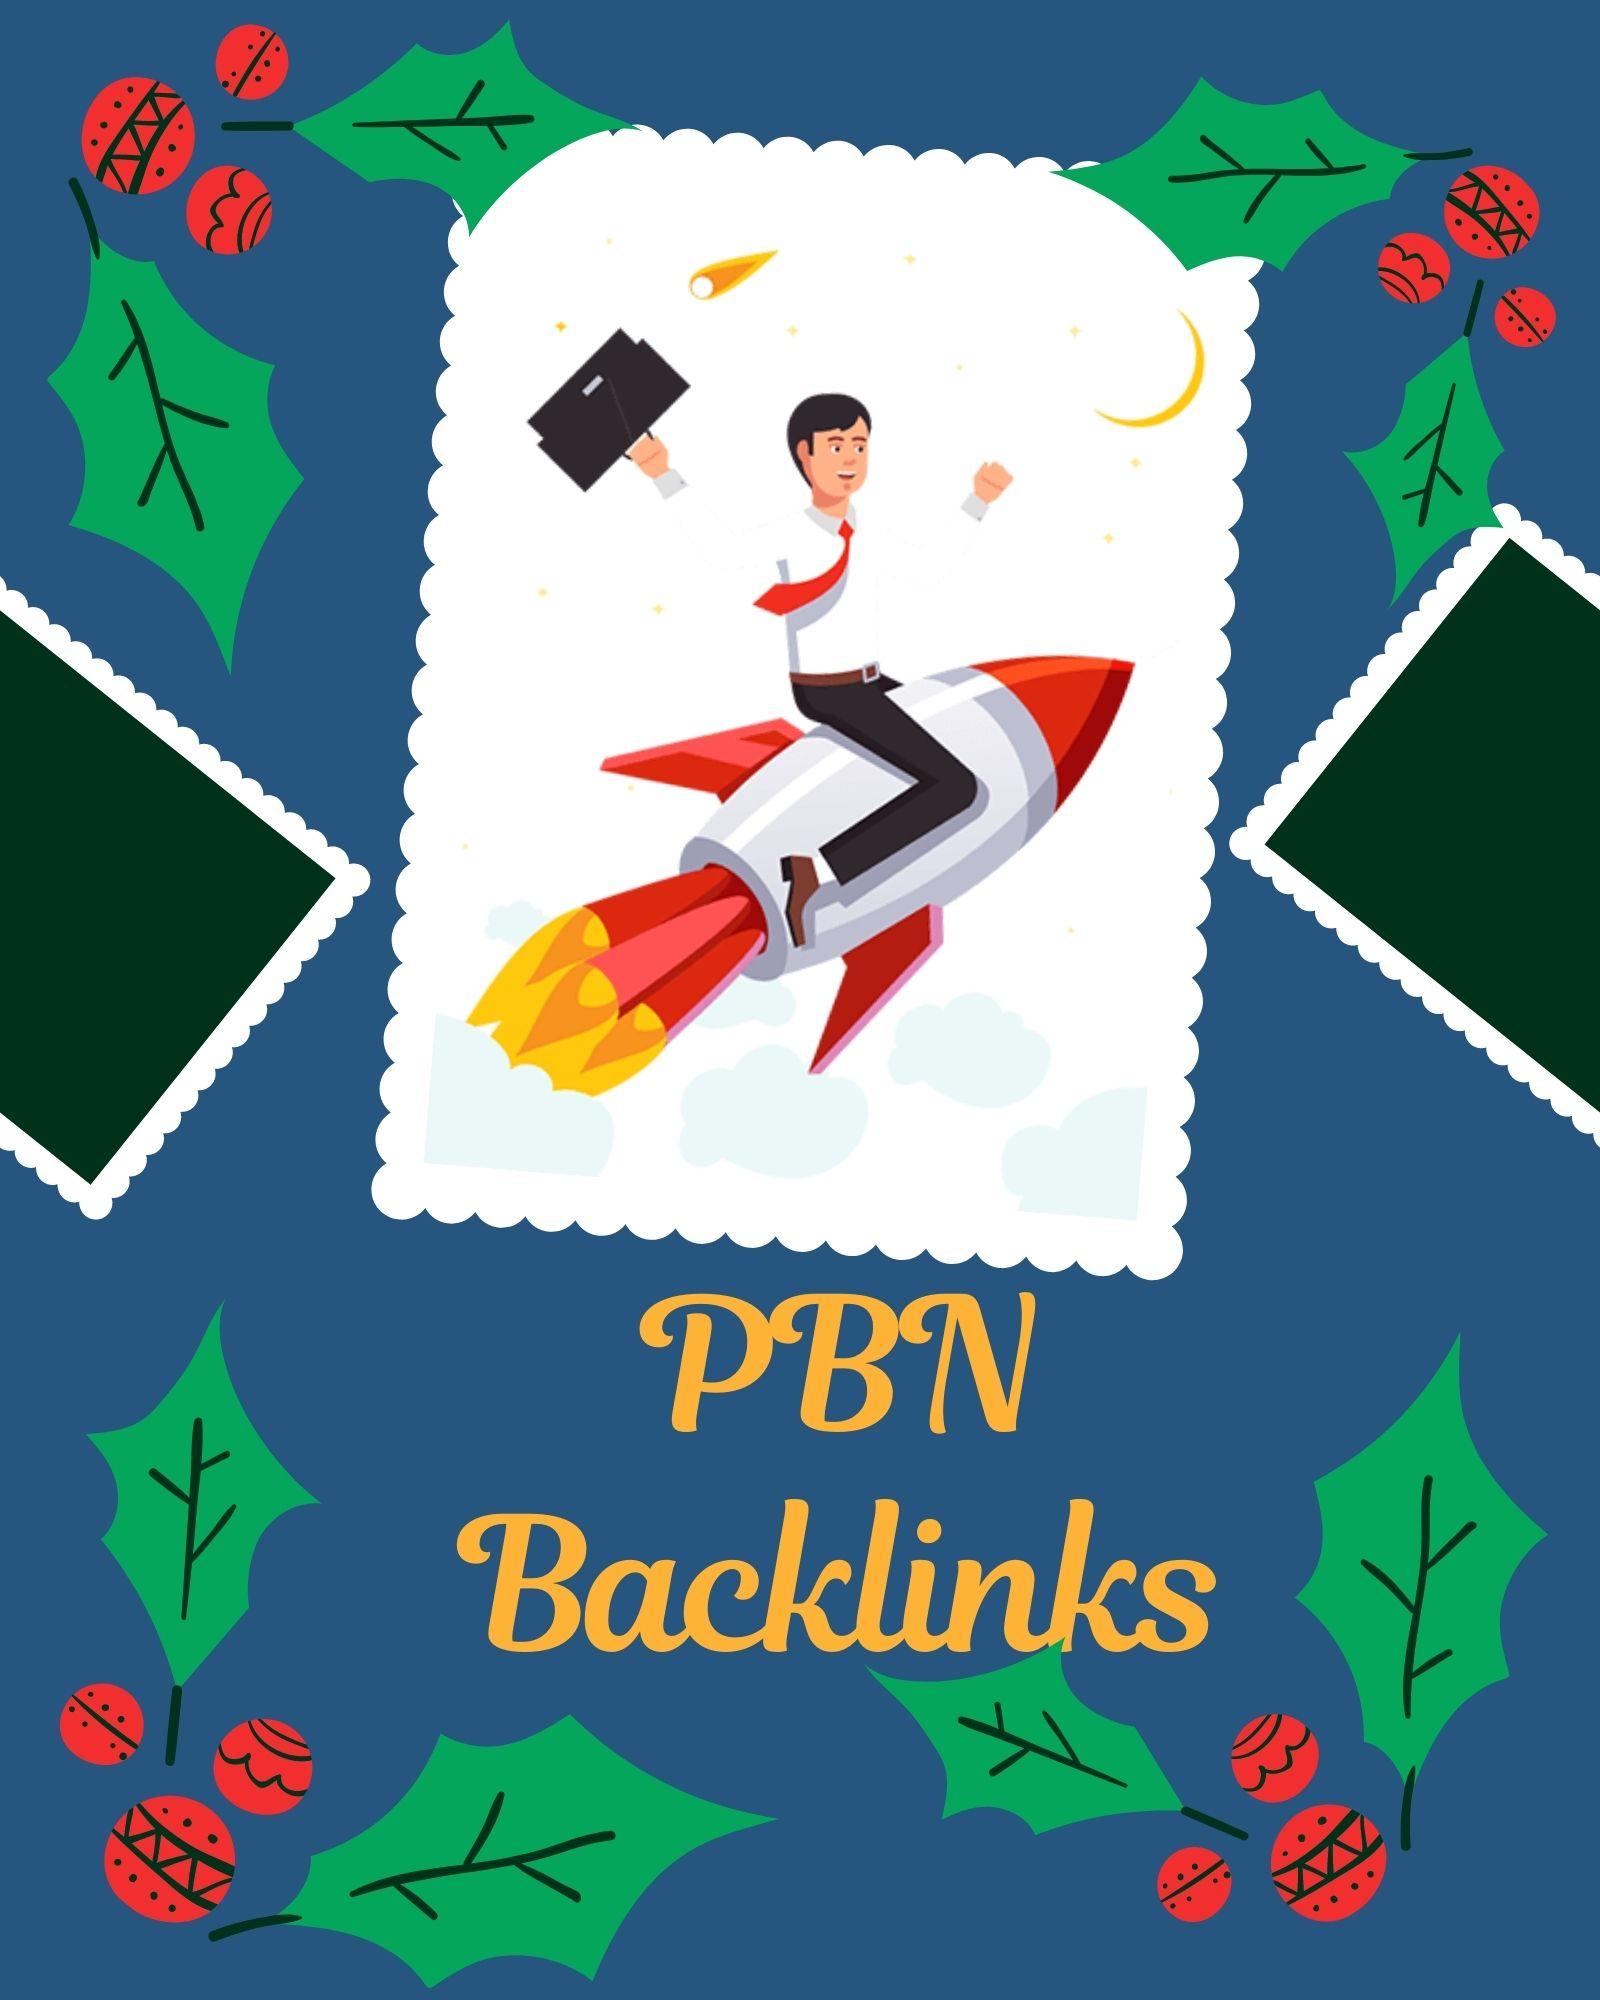 25+ Blog post High Quality PBN Backlinks for your Websites